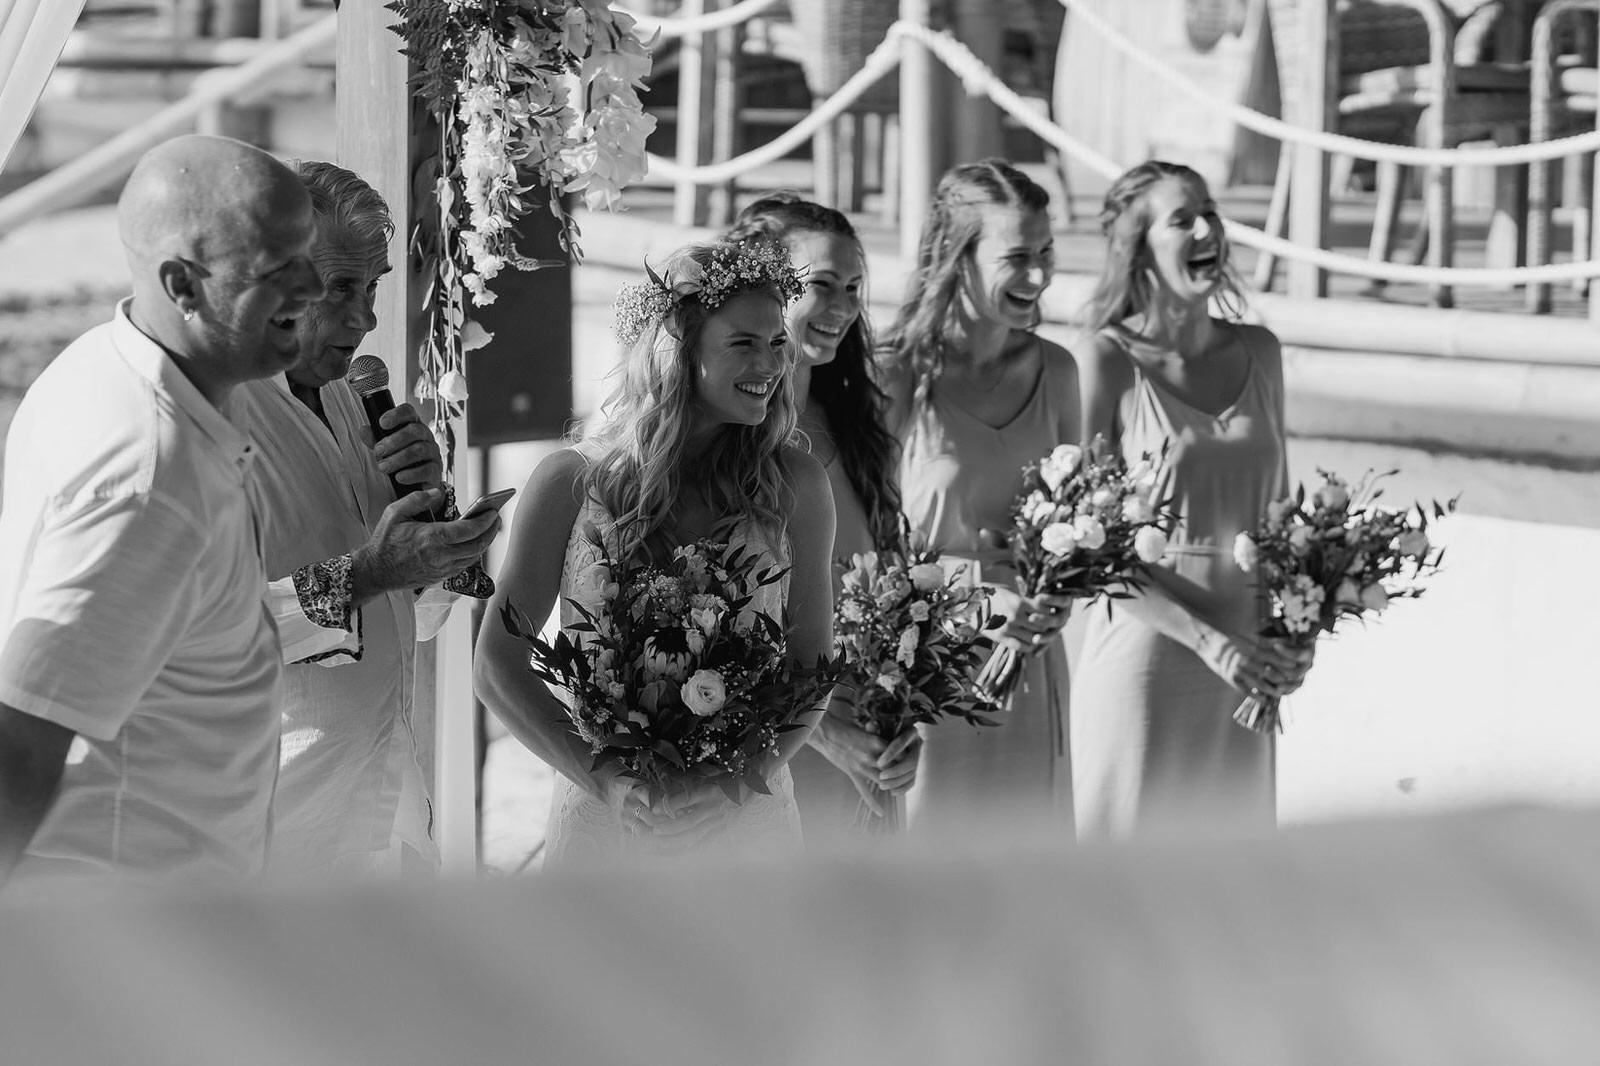 newfound-hai-tide-nusa-lembongan-bali-wedding-photographers-113